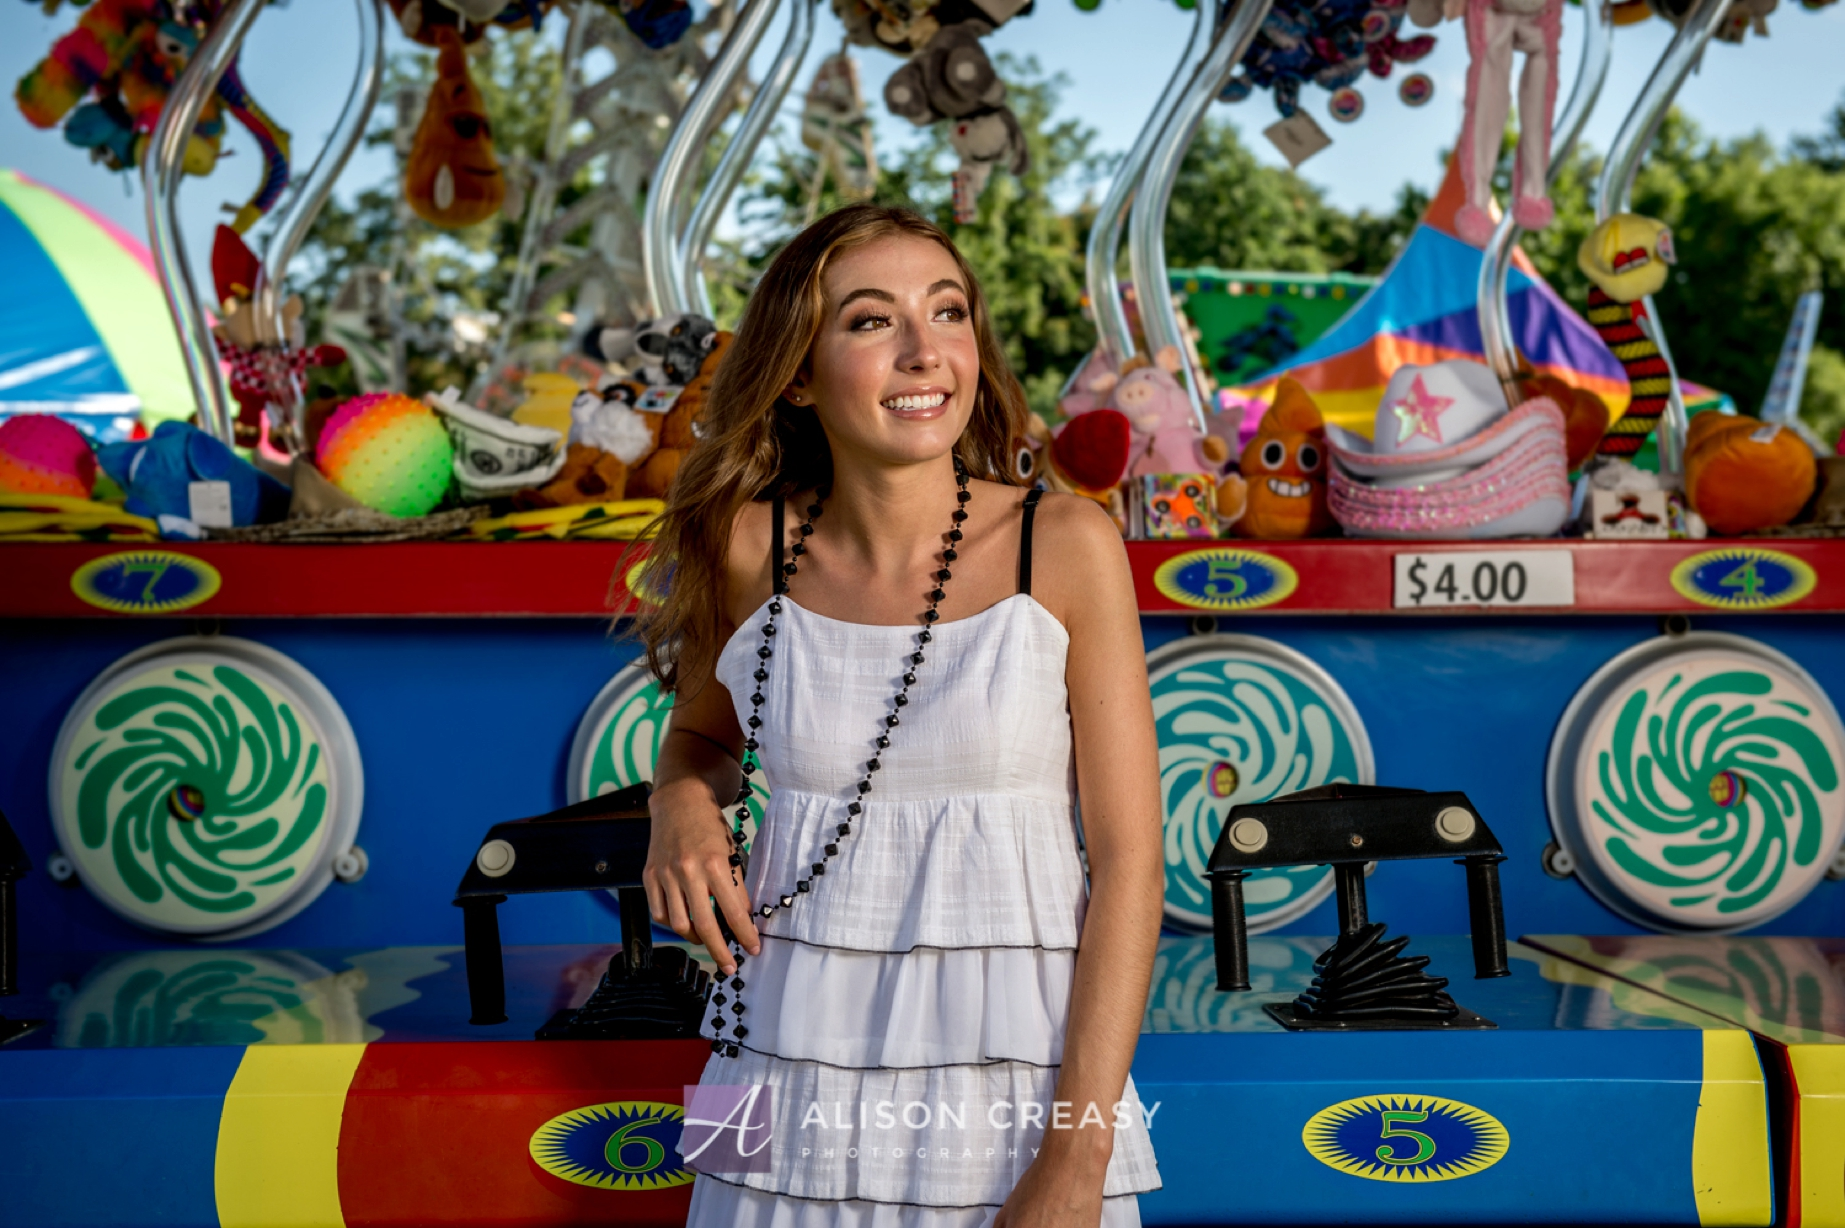 Alison-Creasy-Photography-Lynchburg-VA-Senior- Photographer_0007.jpg